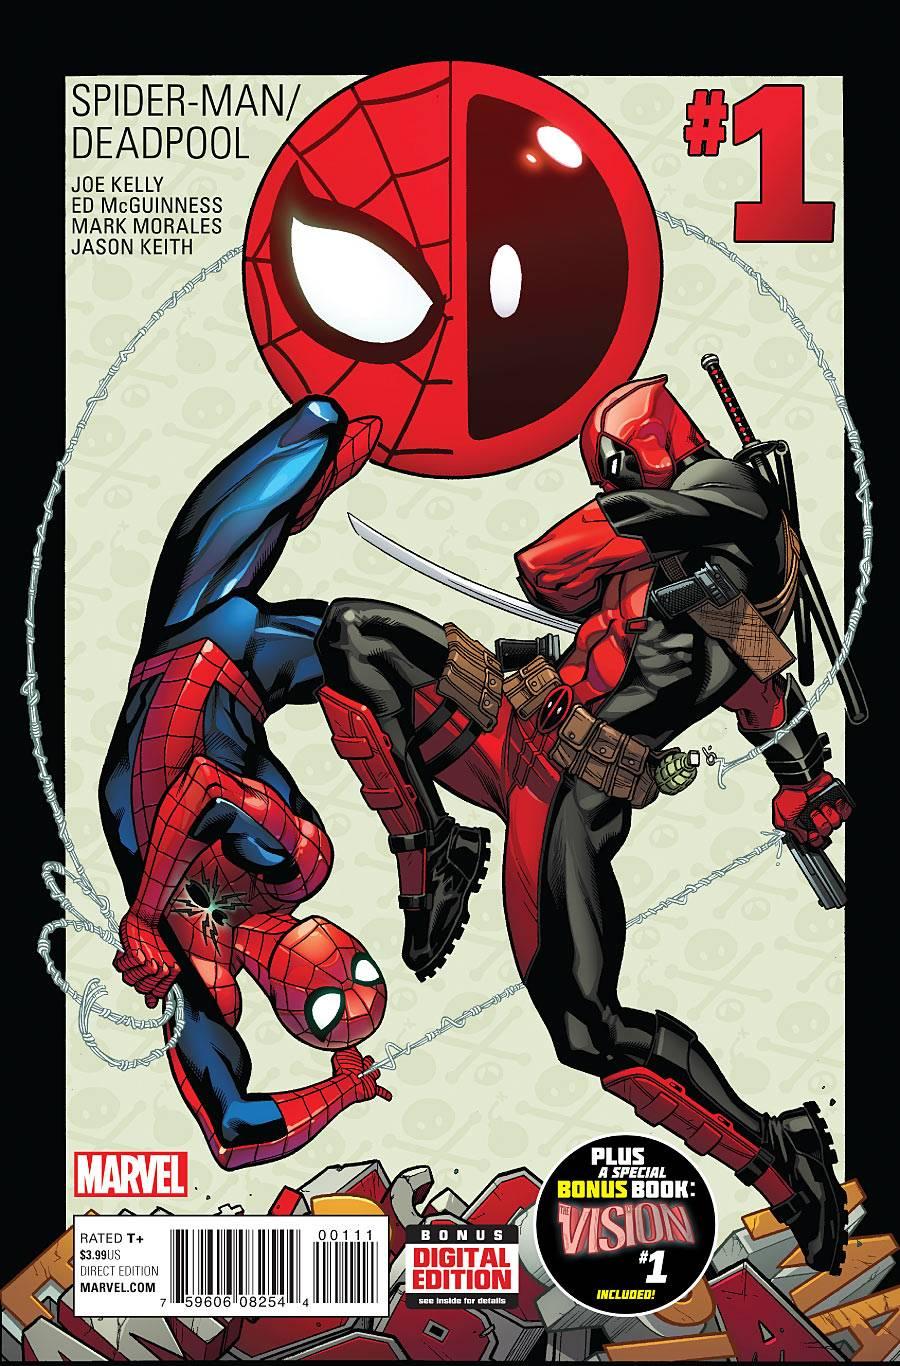 SPIDER-MAN / DEADPOOL #1